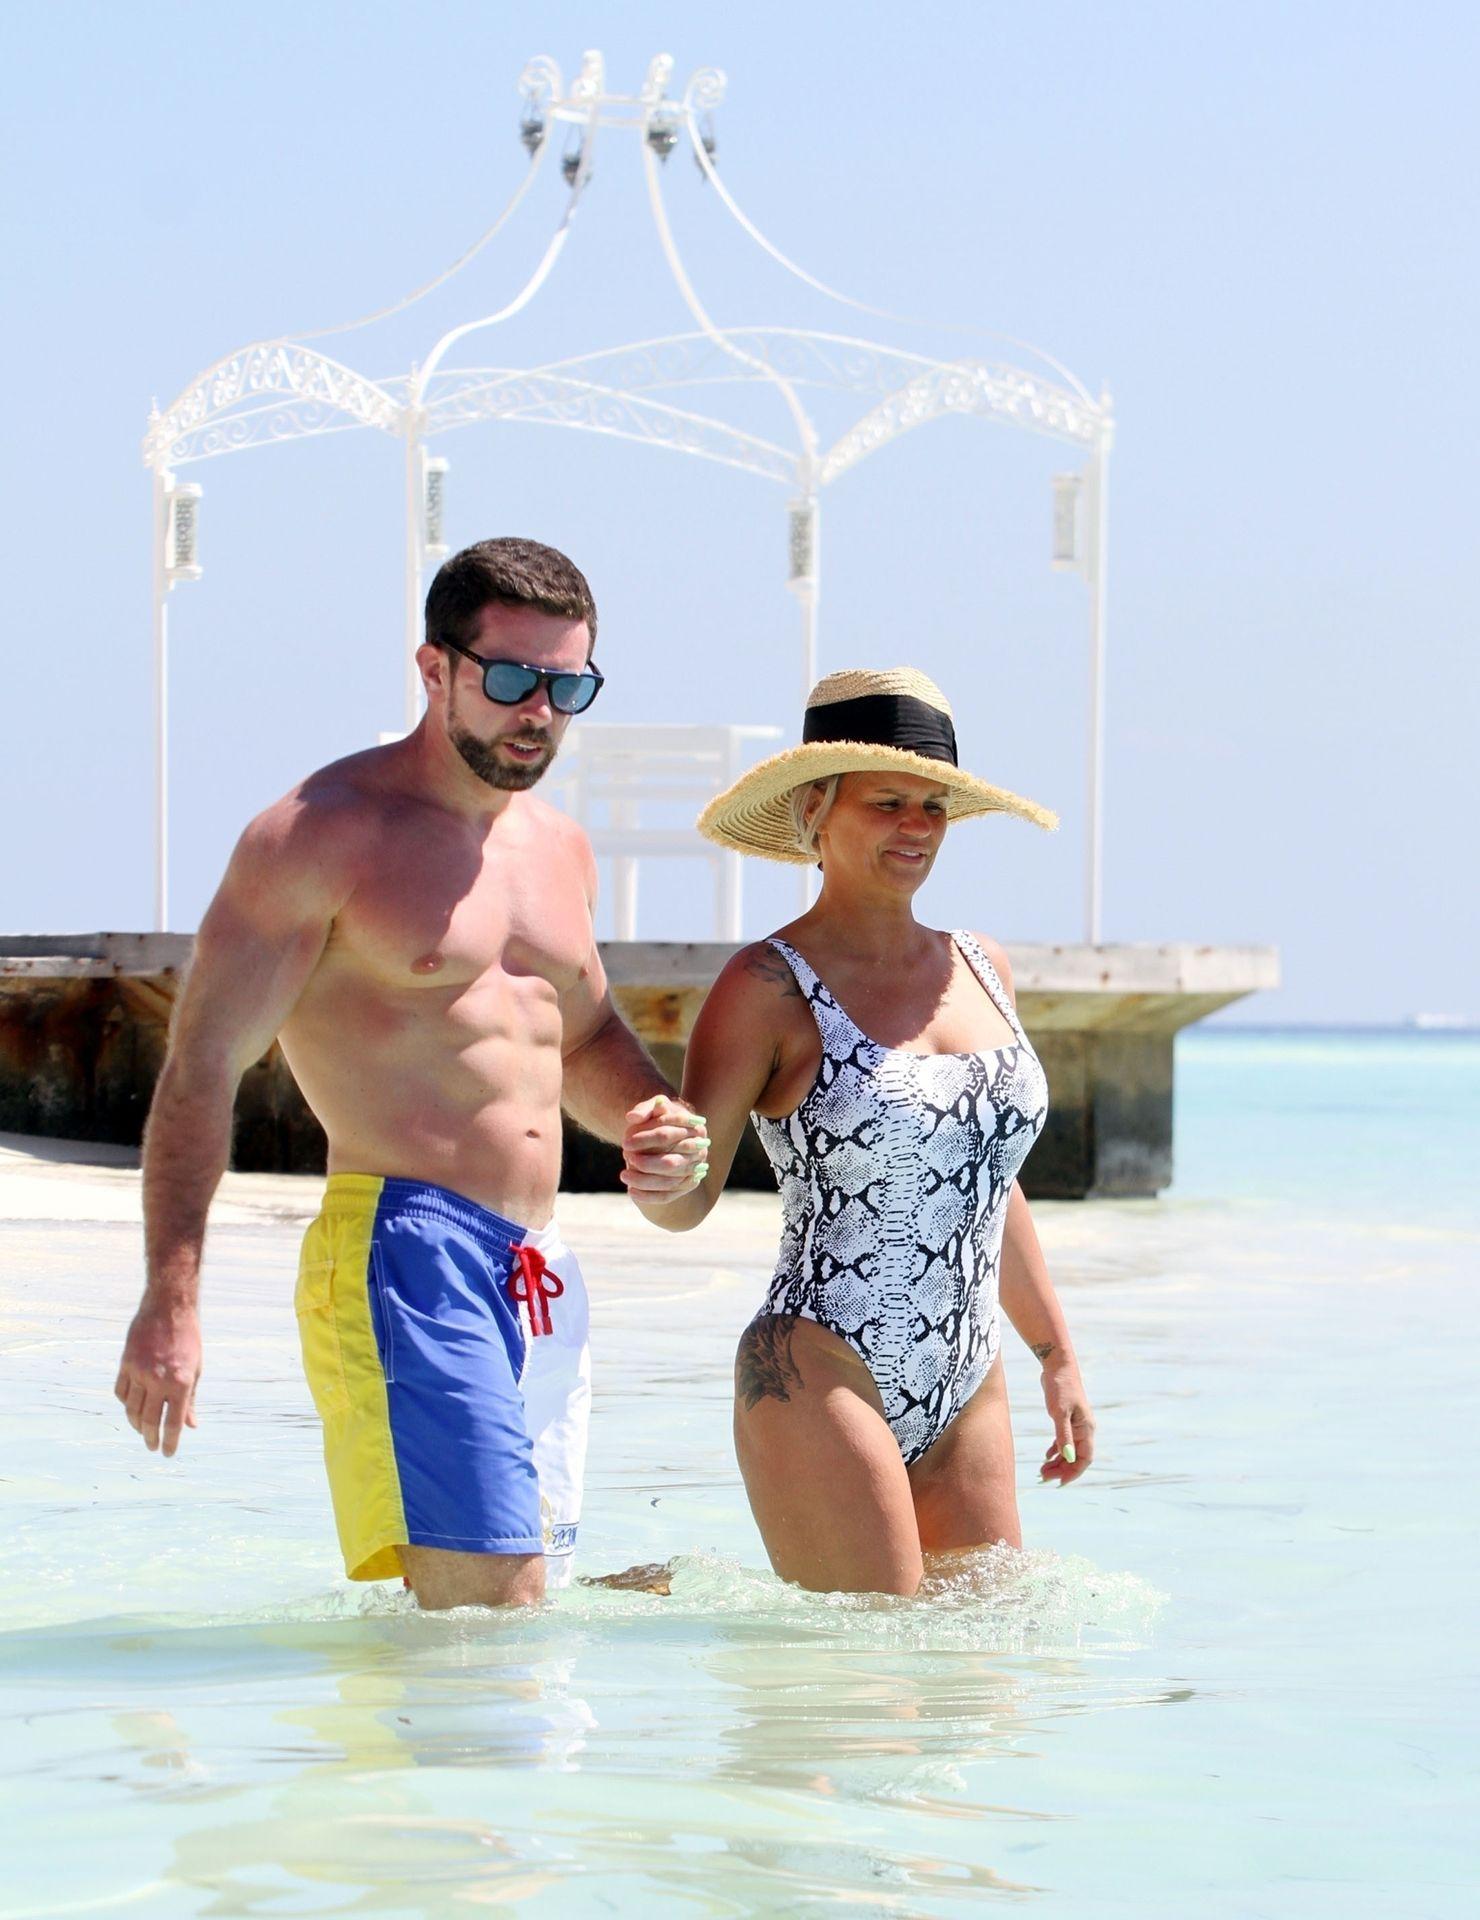 Kerry Katona & Ryan Mahoney Hit The Beach On Holiday At Their Luxury 5 Star Resort Ayada Maldives 0028